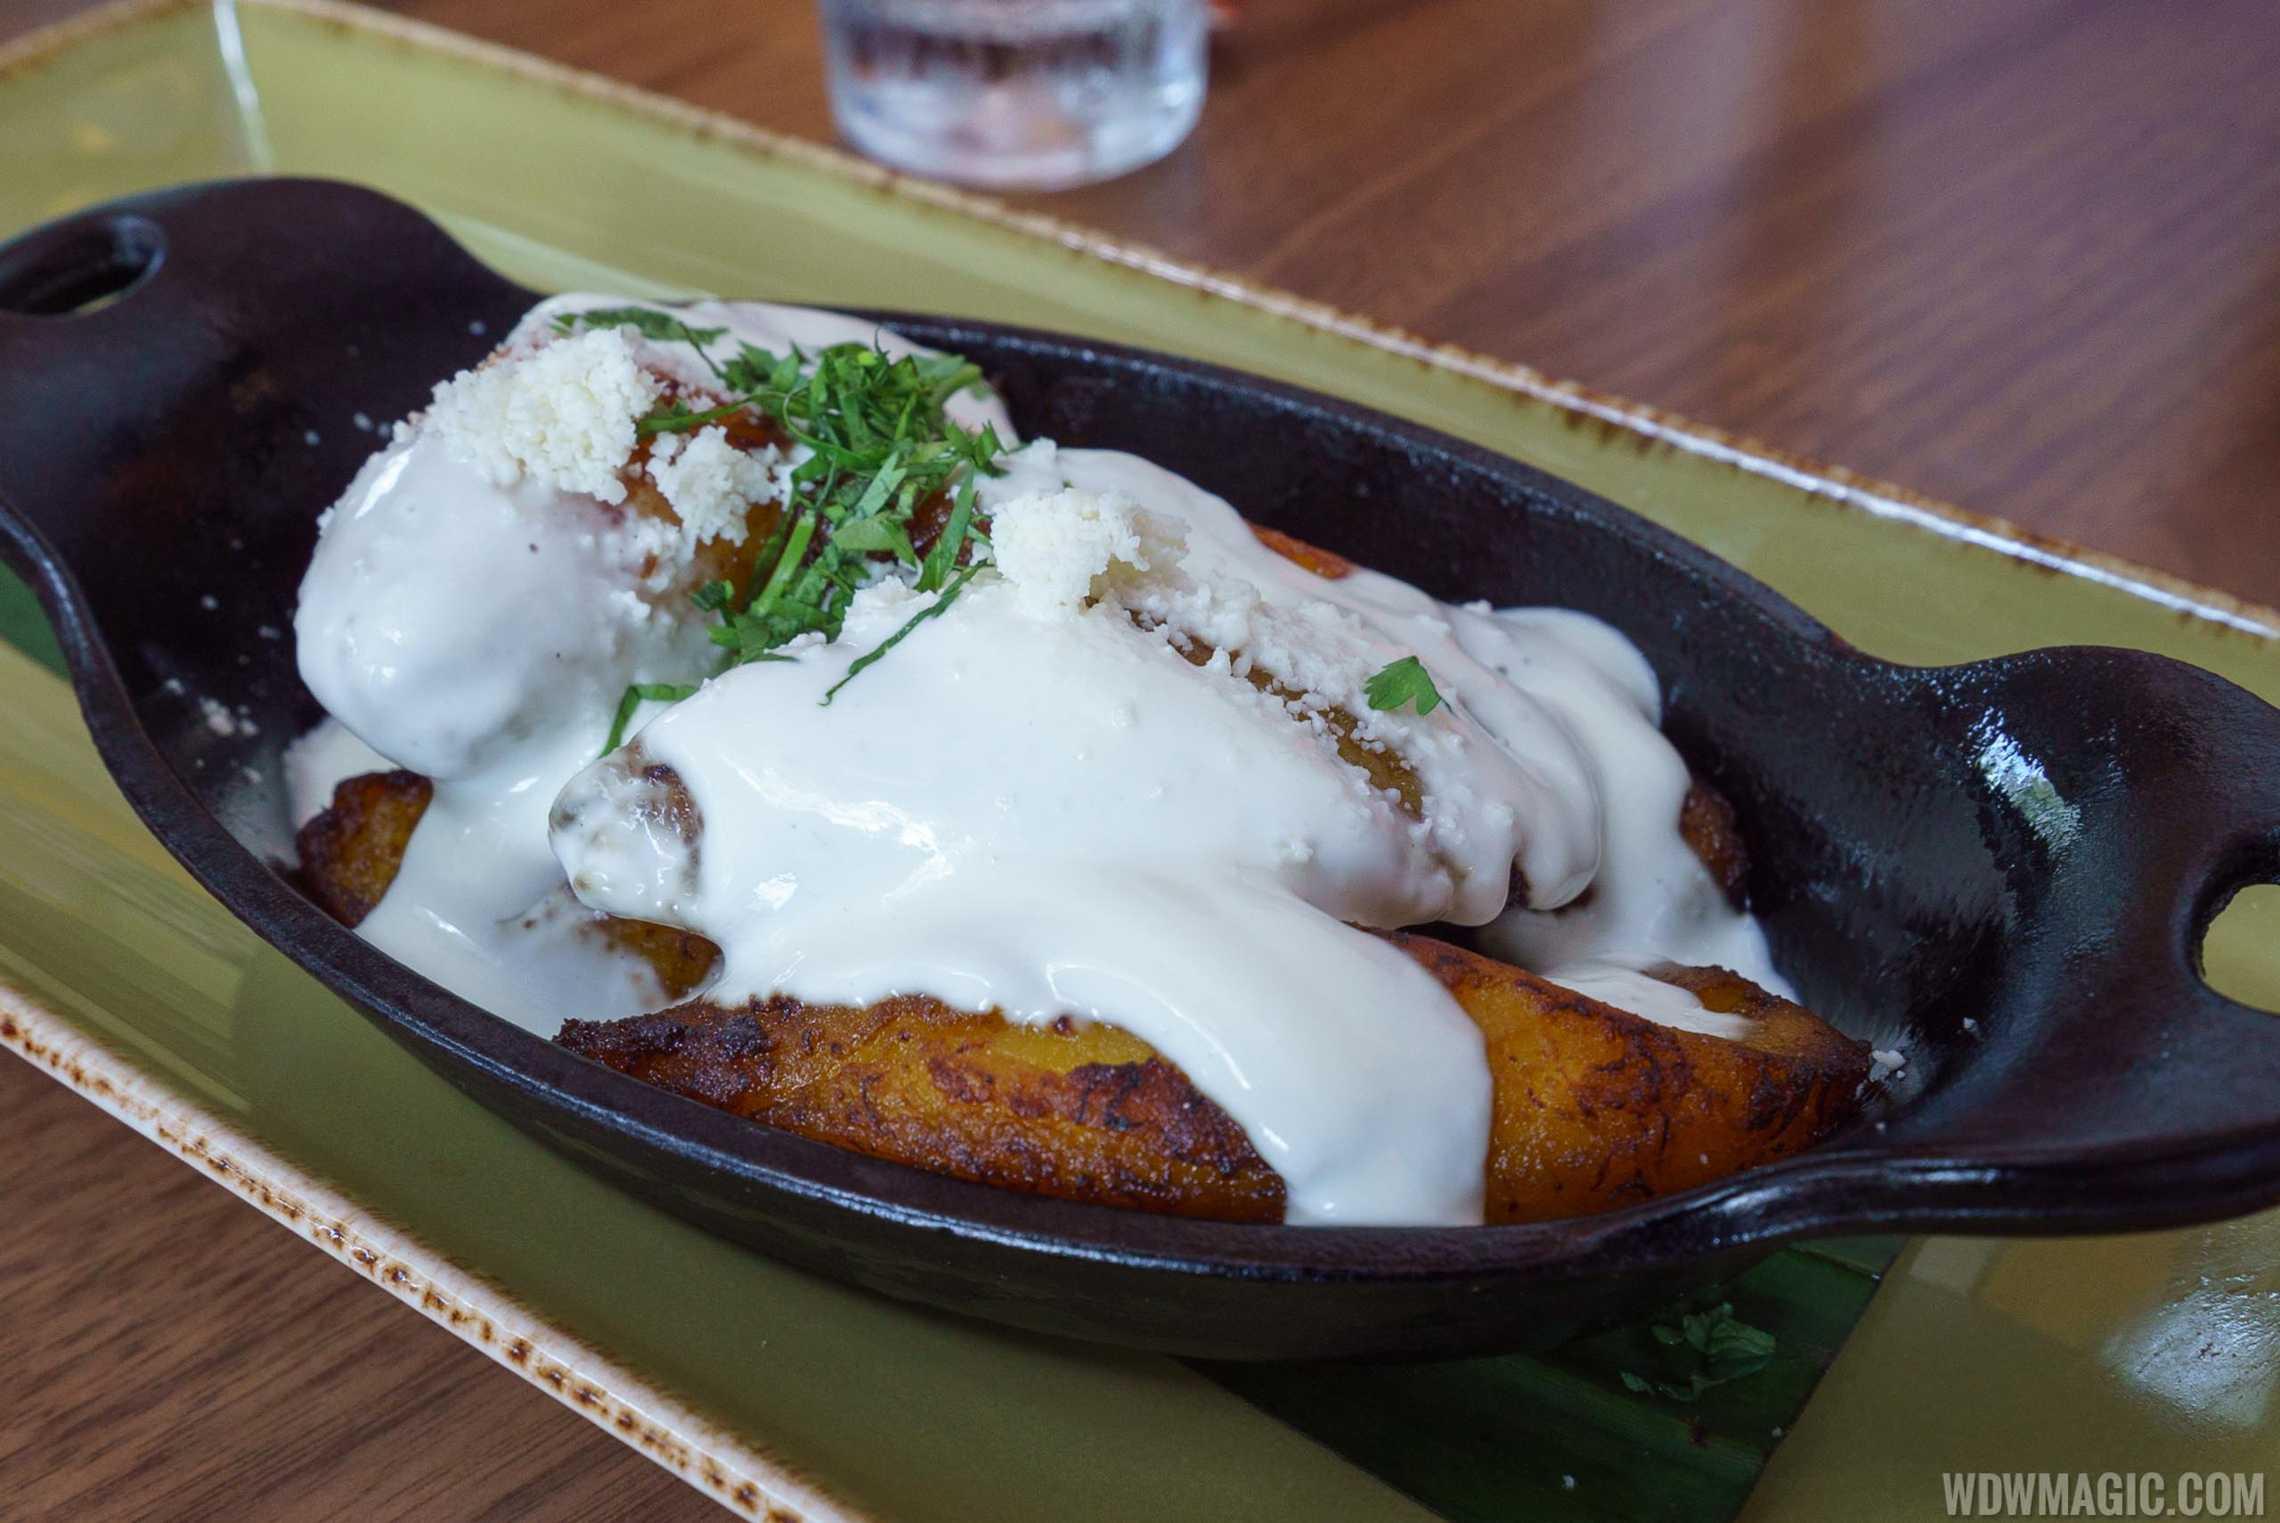 Frontera Cocina - Fried Plantains